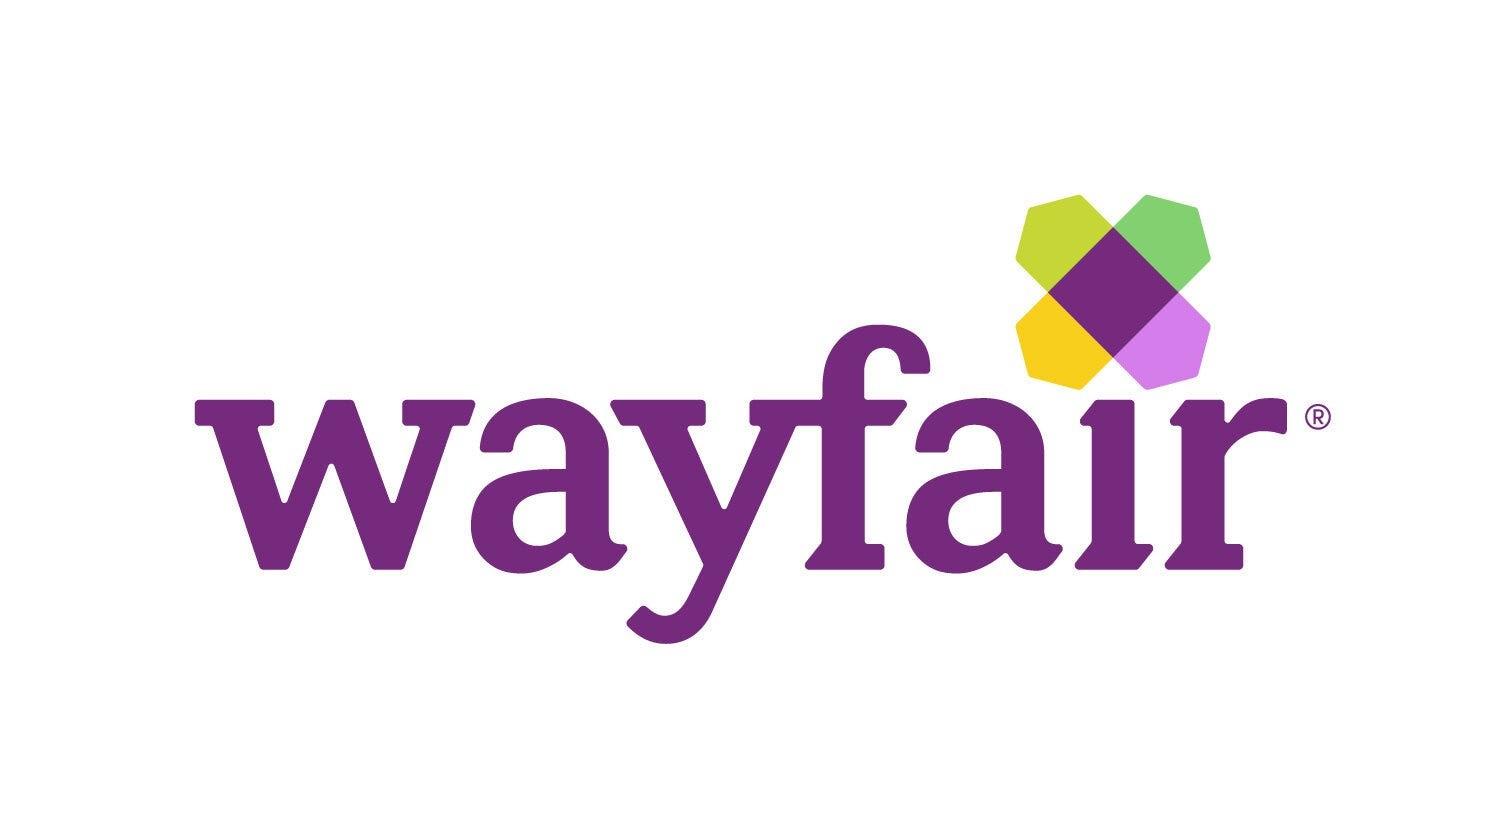 Wayfair美国家居电商购物平台将在2021年保持增长的3个原因